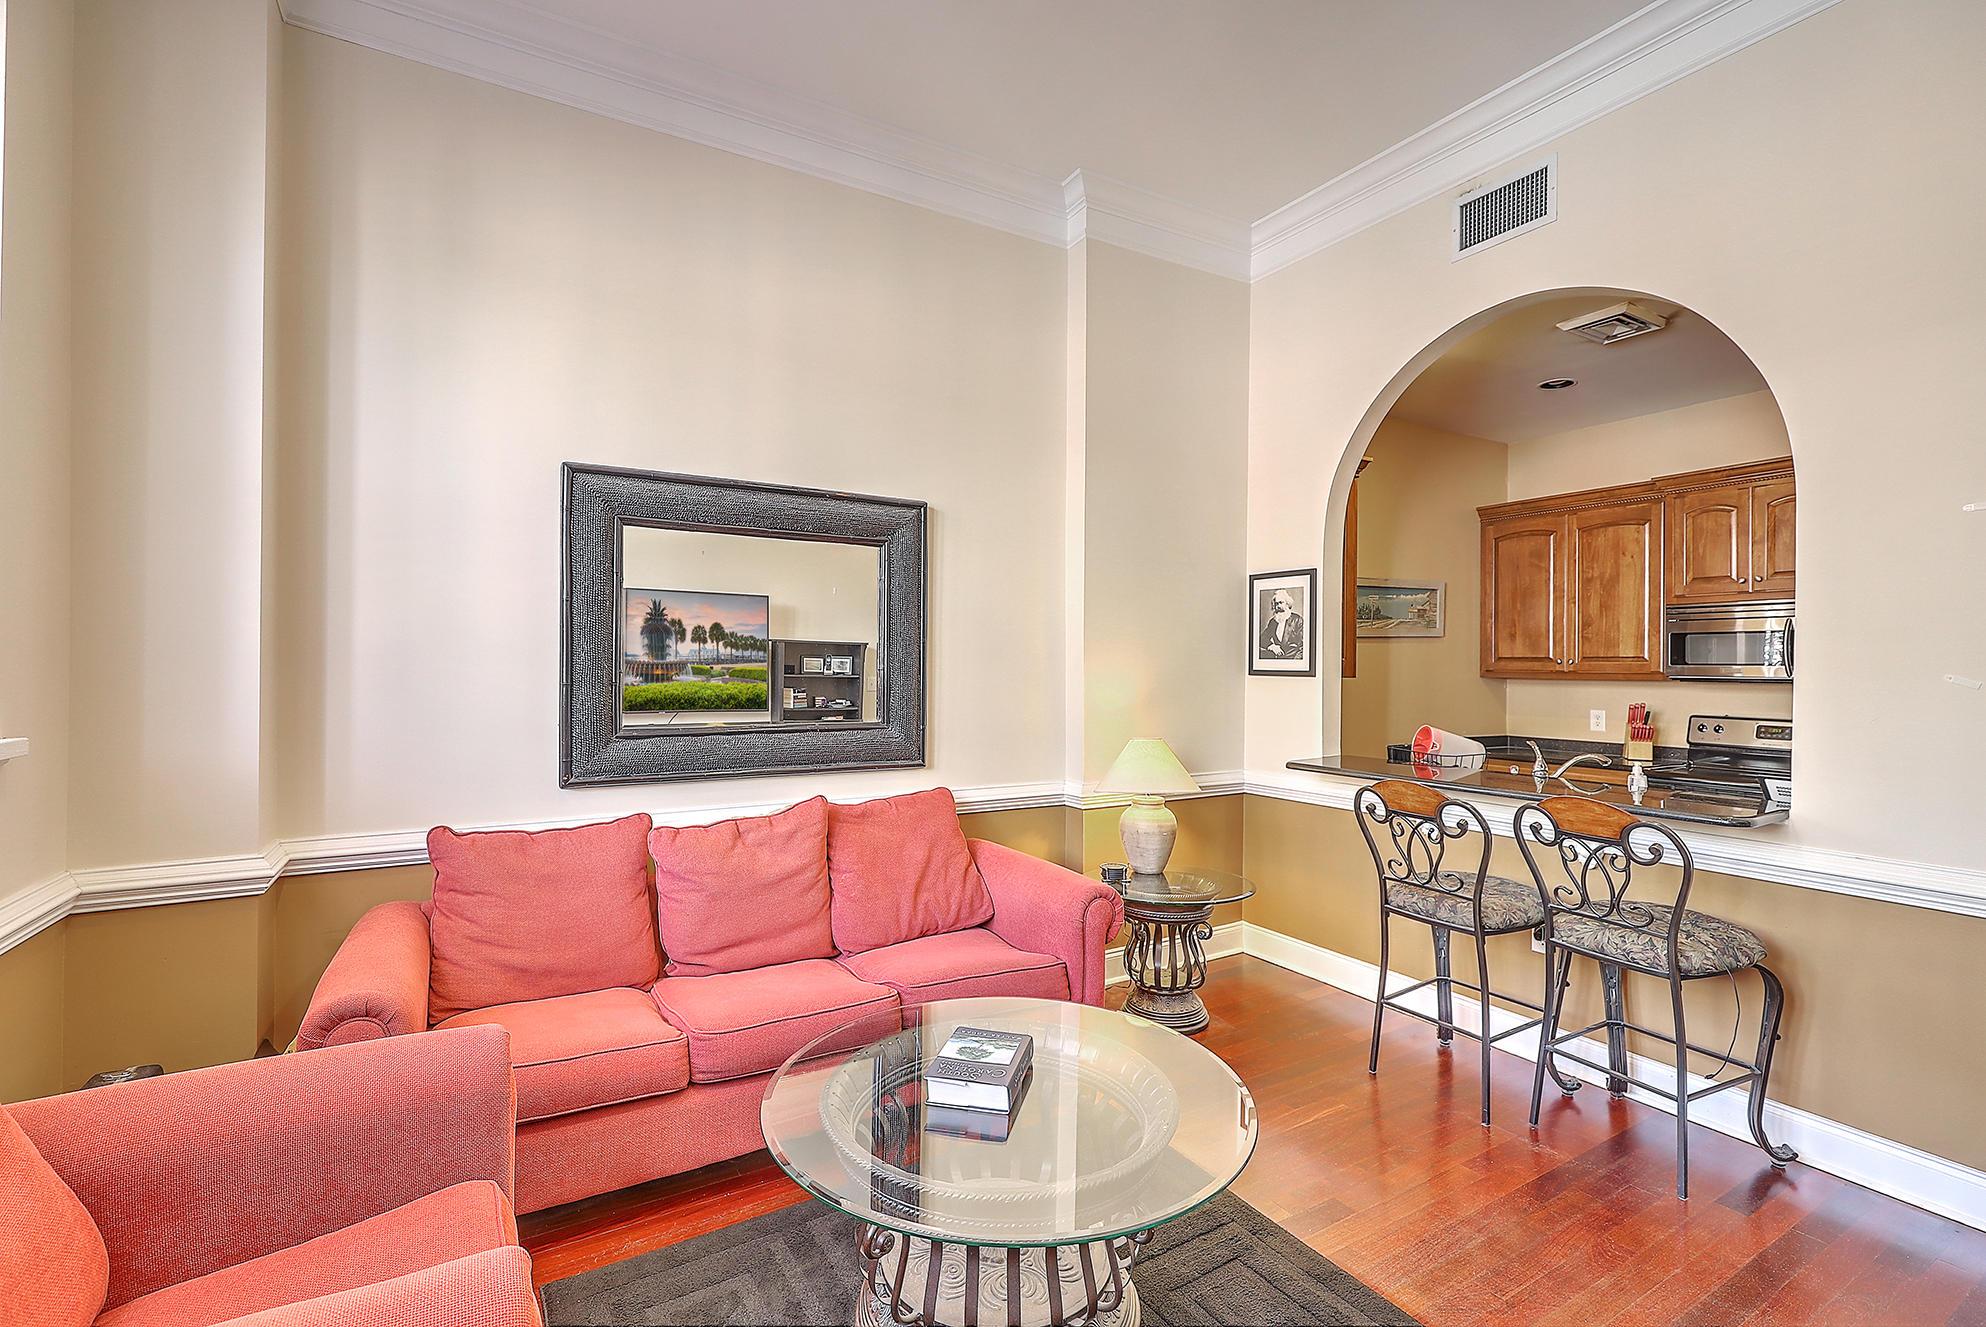 King Street Lofts Homes For Sale - 350 King, Charleston, SC - 2